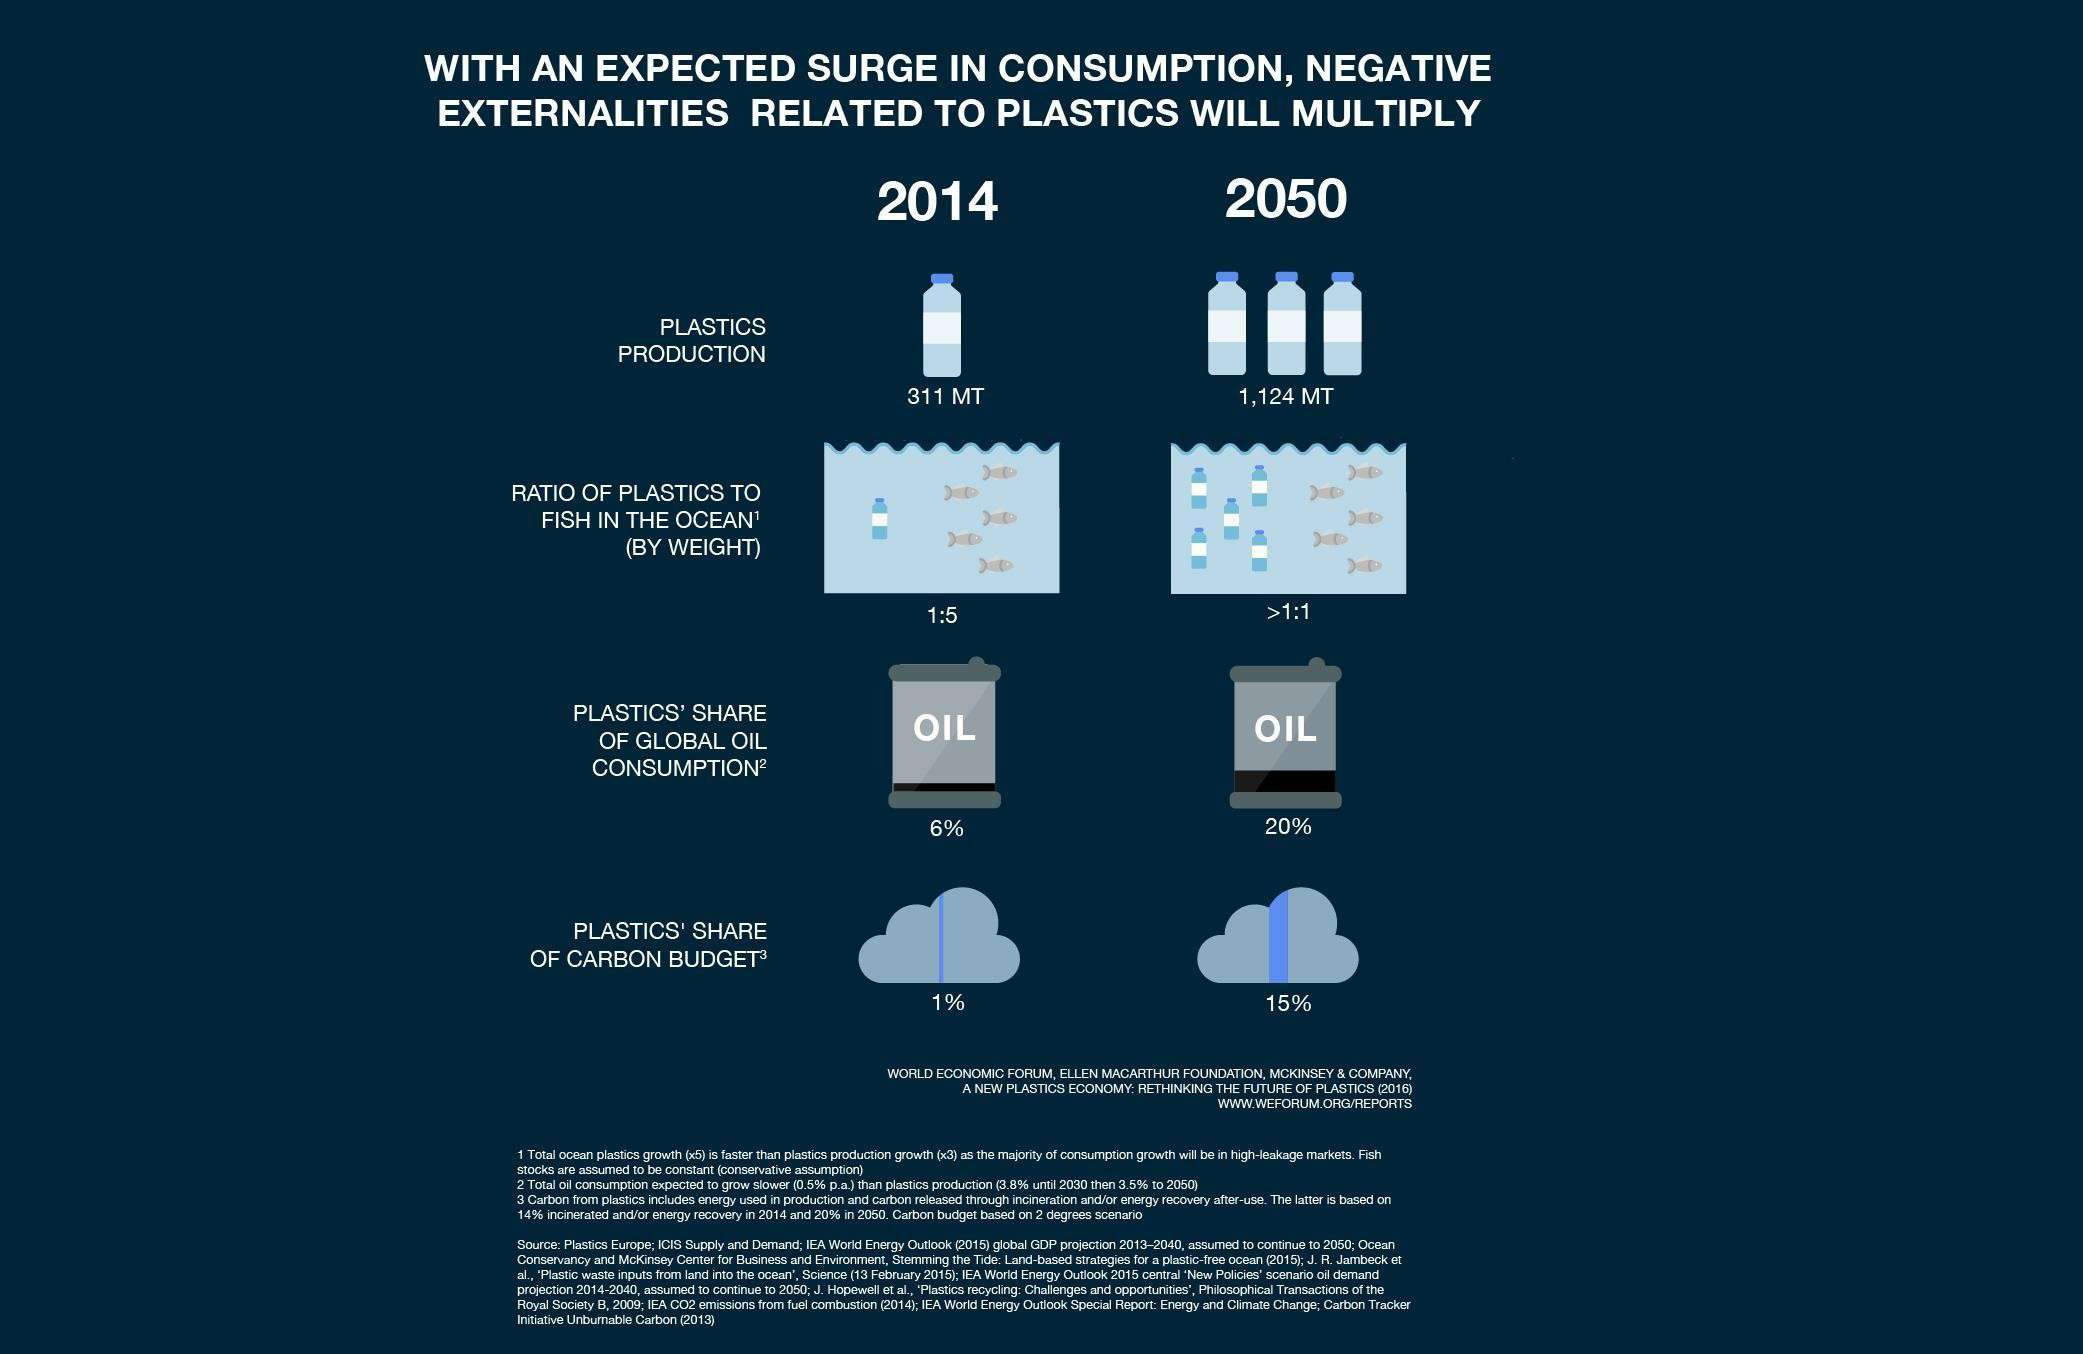 New Plastics Economy infographic, WEF and Ellen MacArthur Foundation